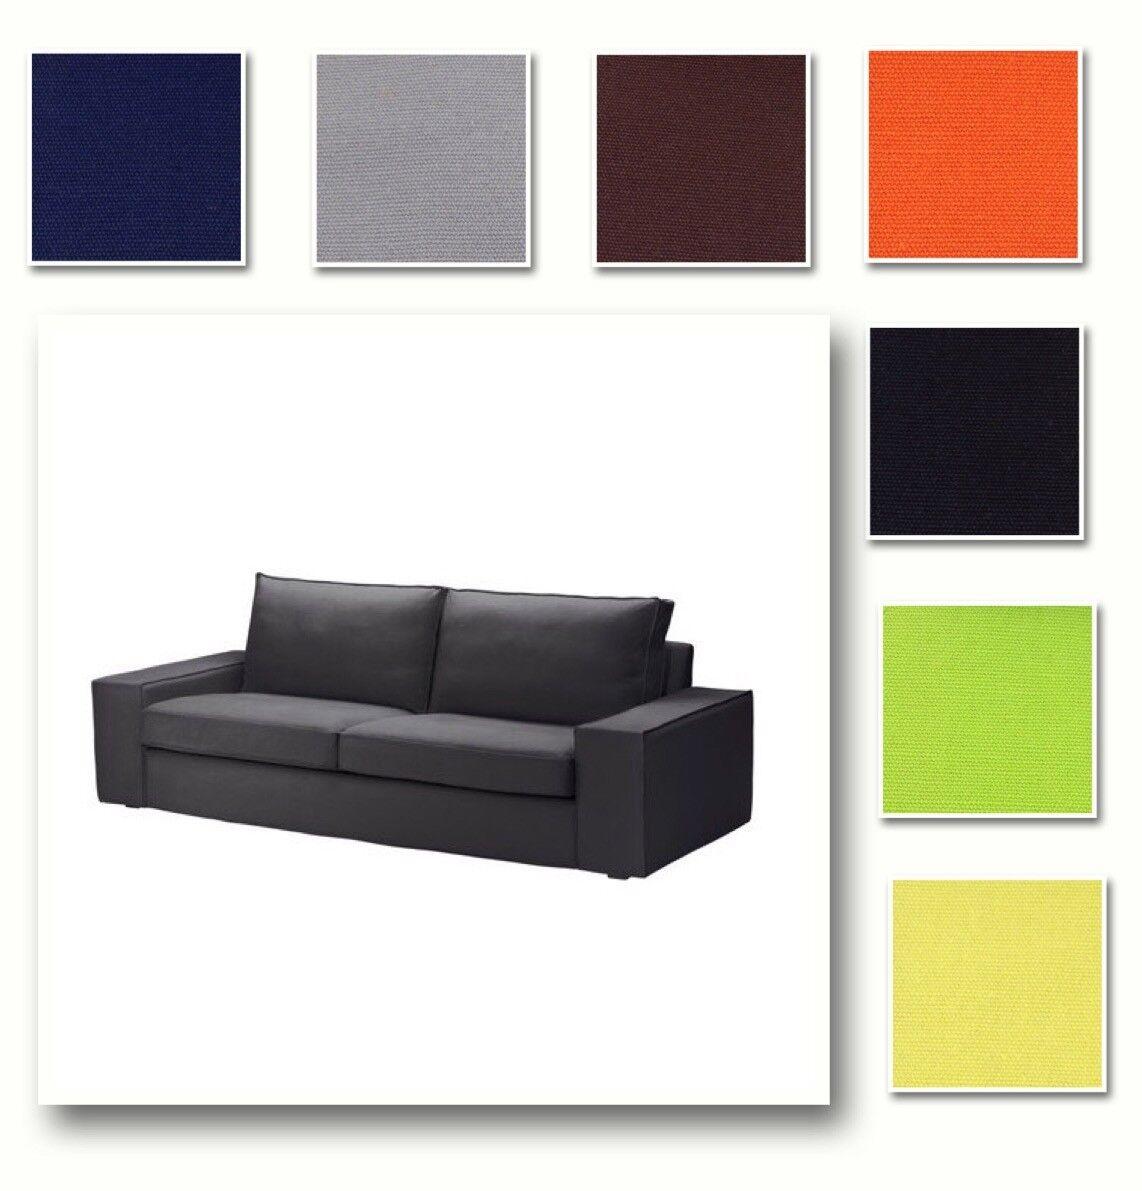 Schlafsofa NEU OVP leuchtend IKEA Bezug Couch Husse Kivik Bettsofa Ingebo rot